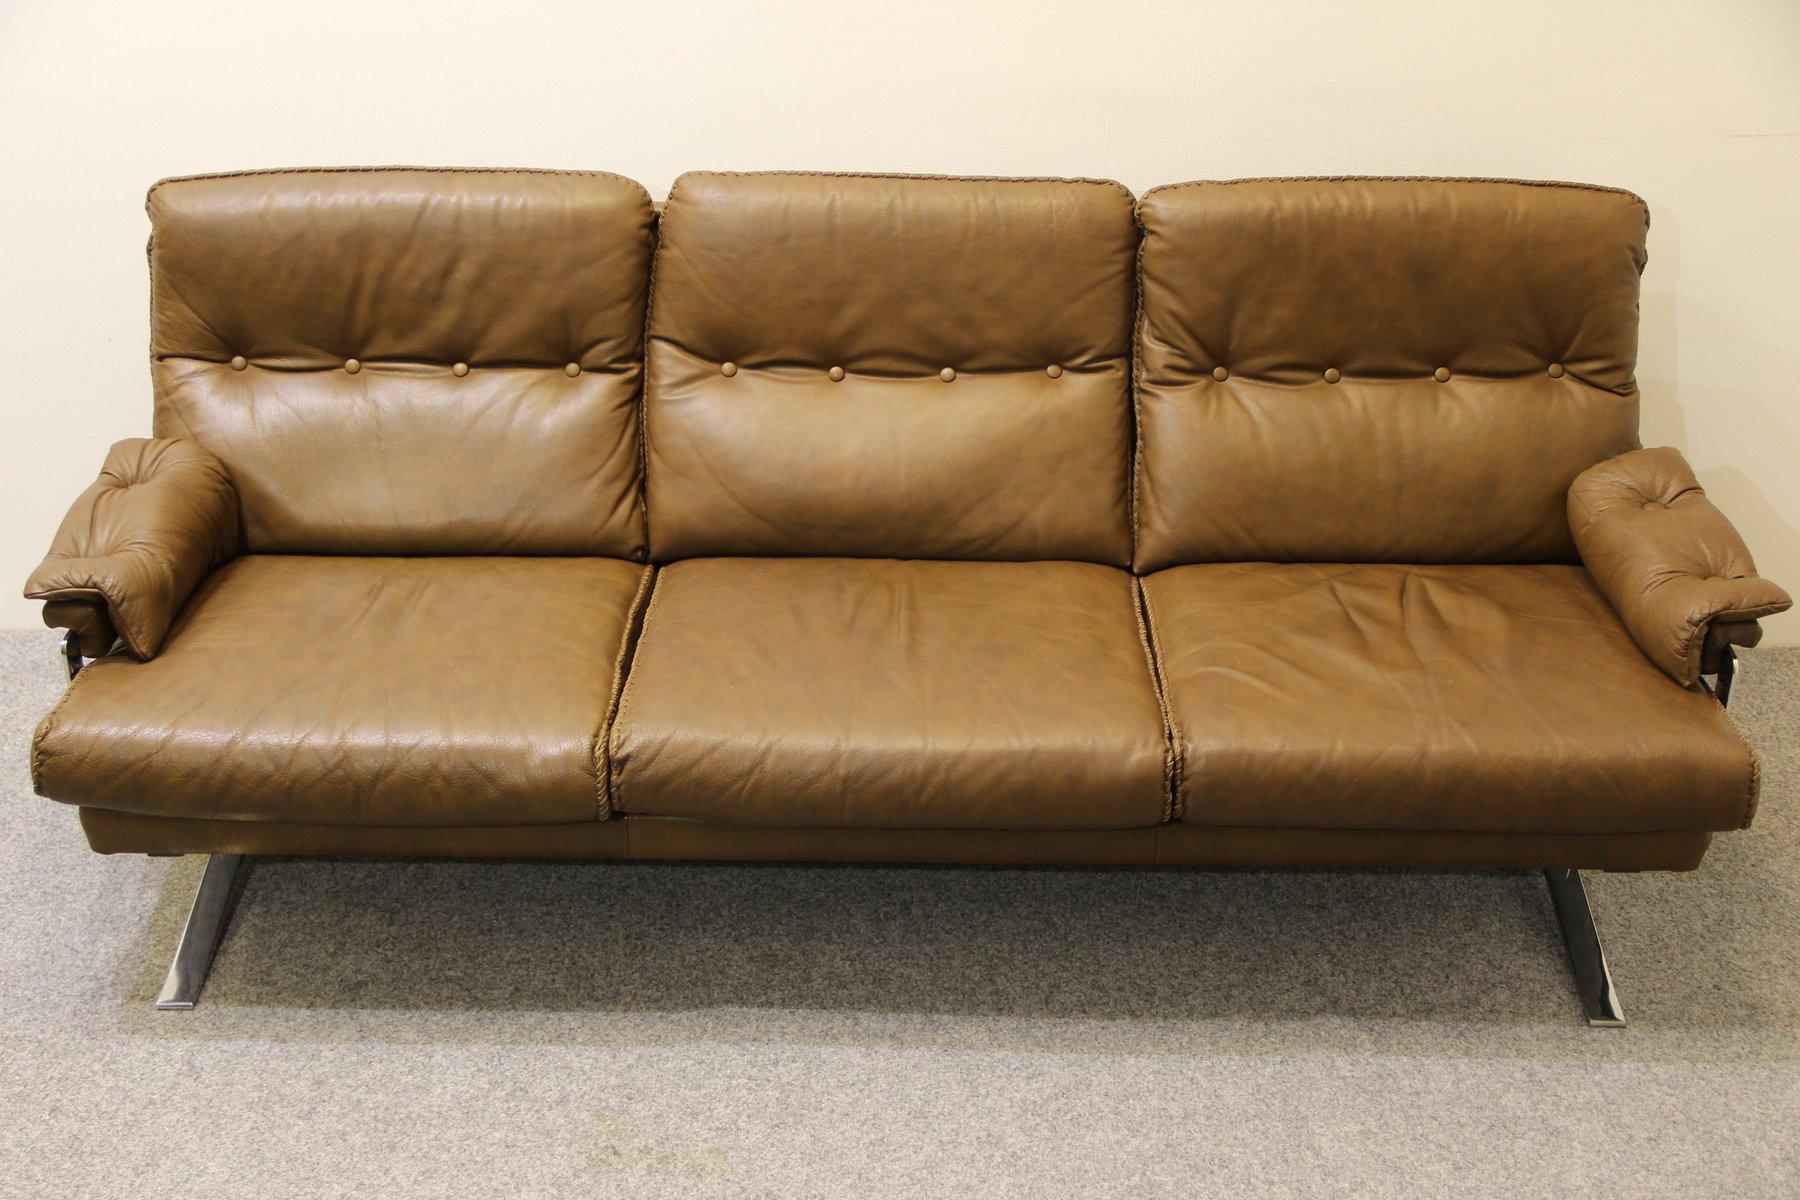 Danish Brown Buffalo Leather Sofa. Arne Norell For Sale At Pamono